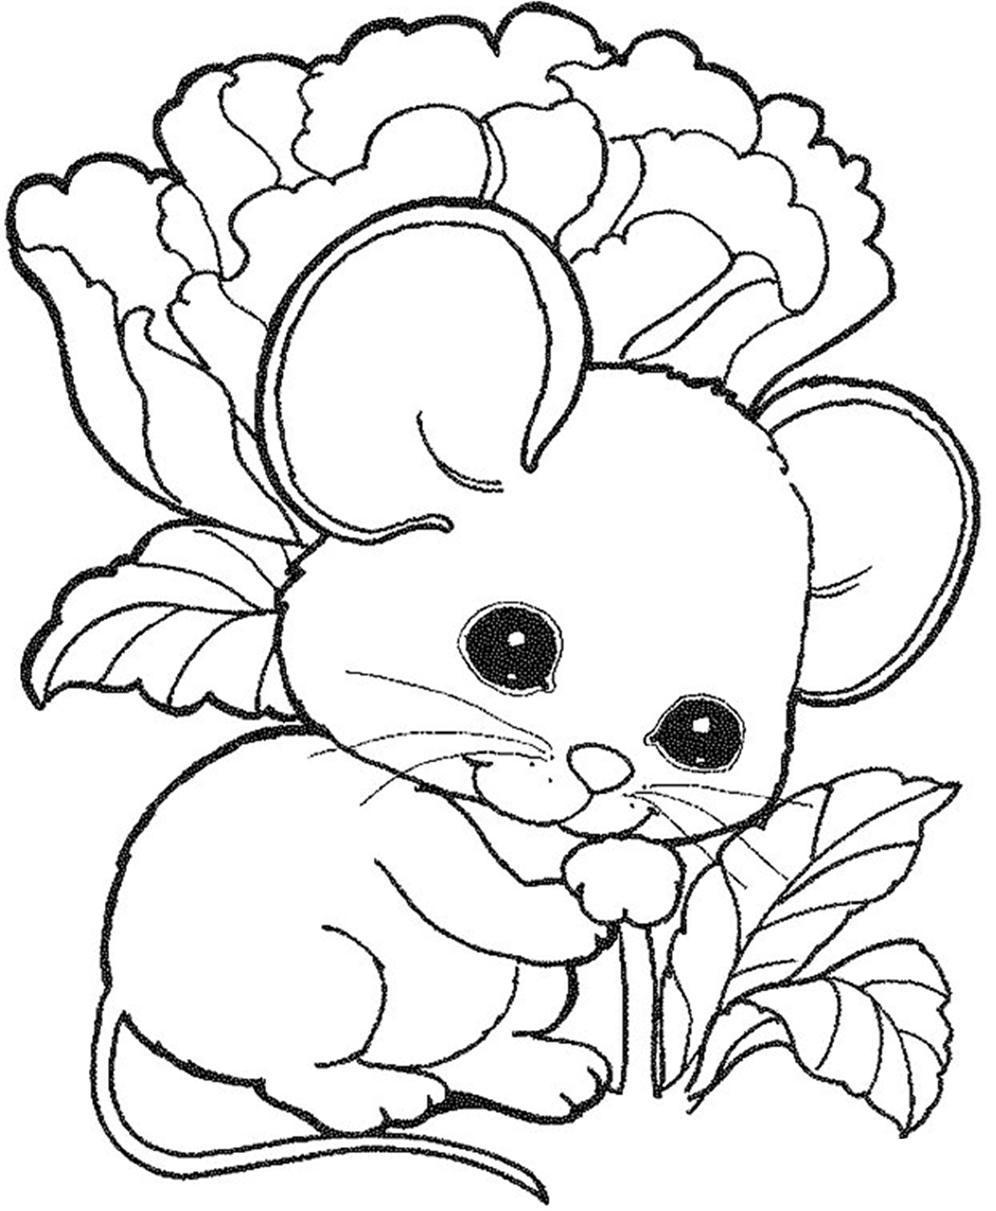 mewarnai gambar binatang tikus 5